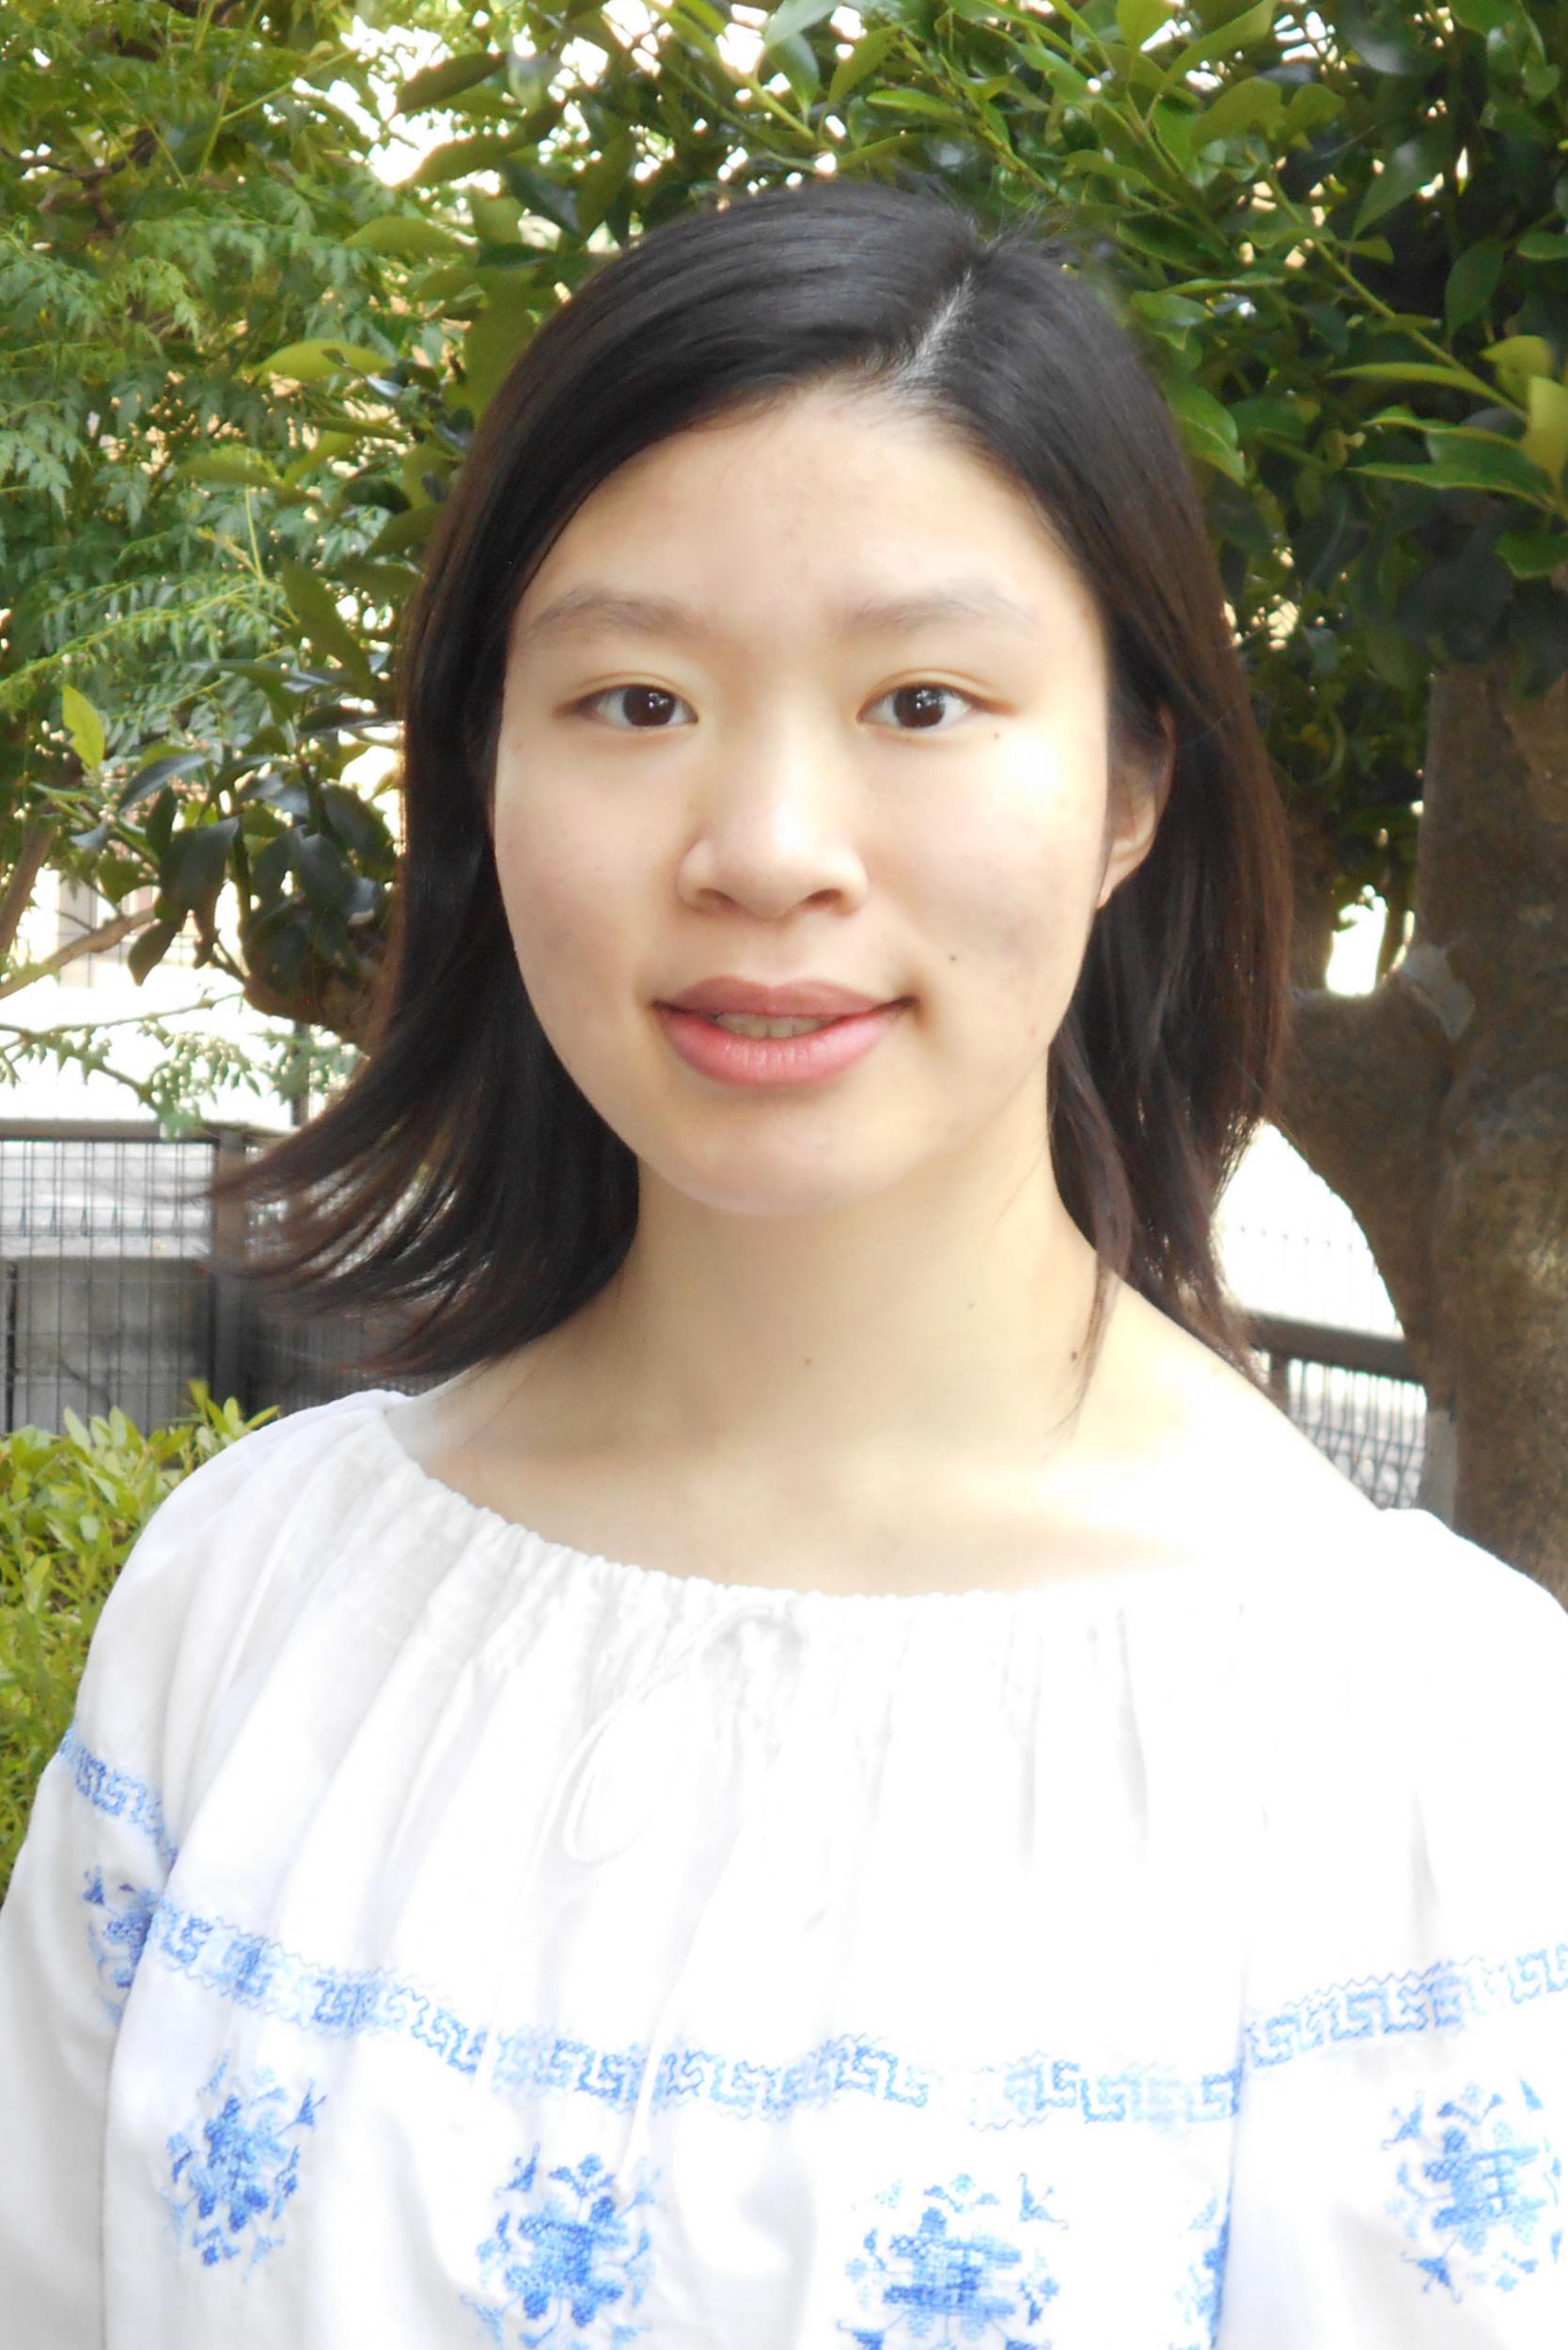 Satoko Hagino | 萩野 聡子